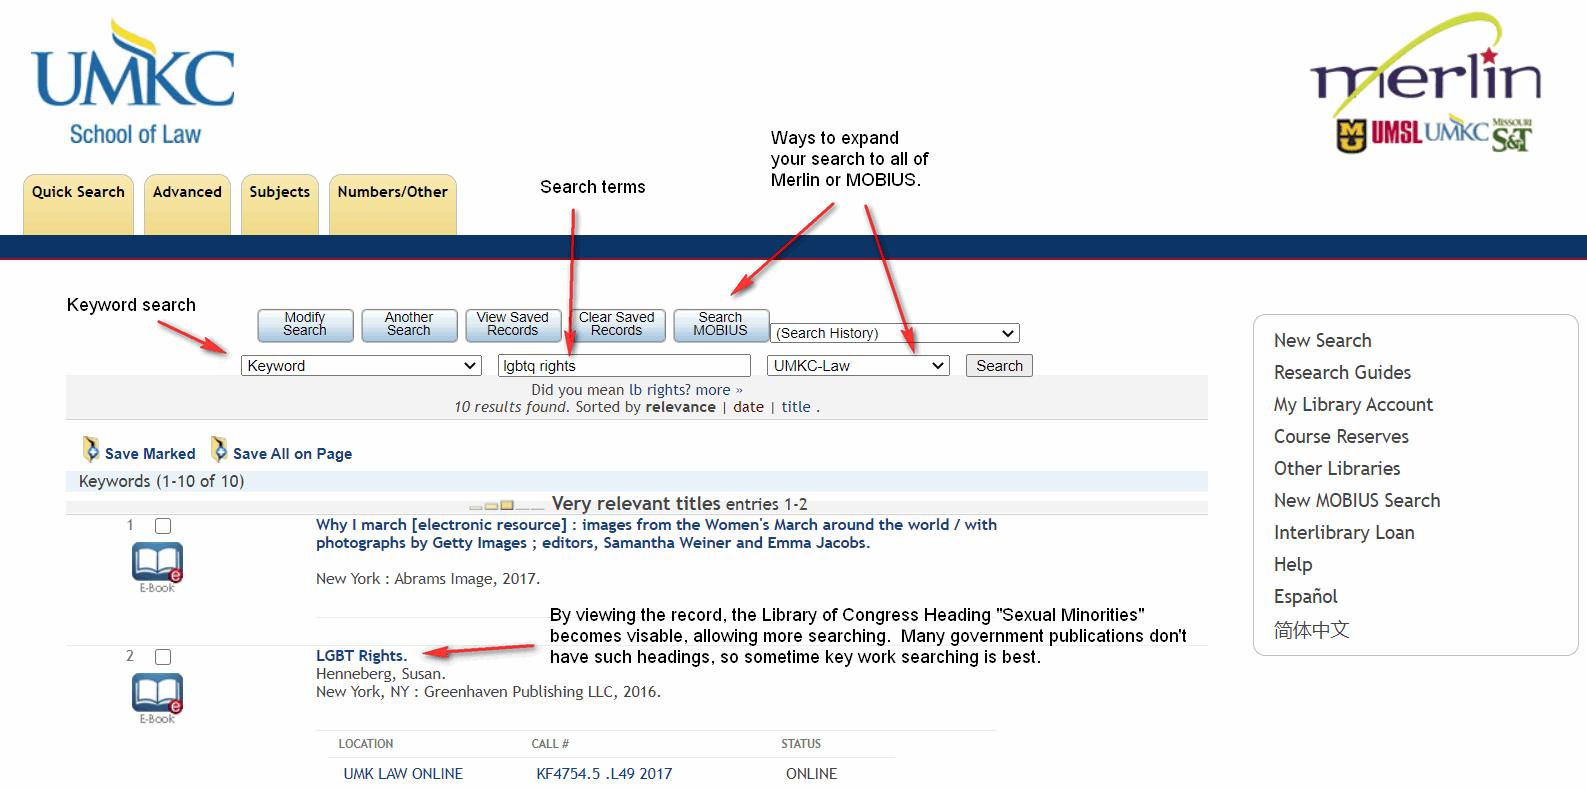 Keyword search for lgbtq rights